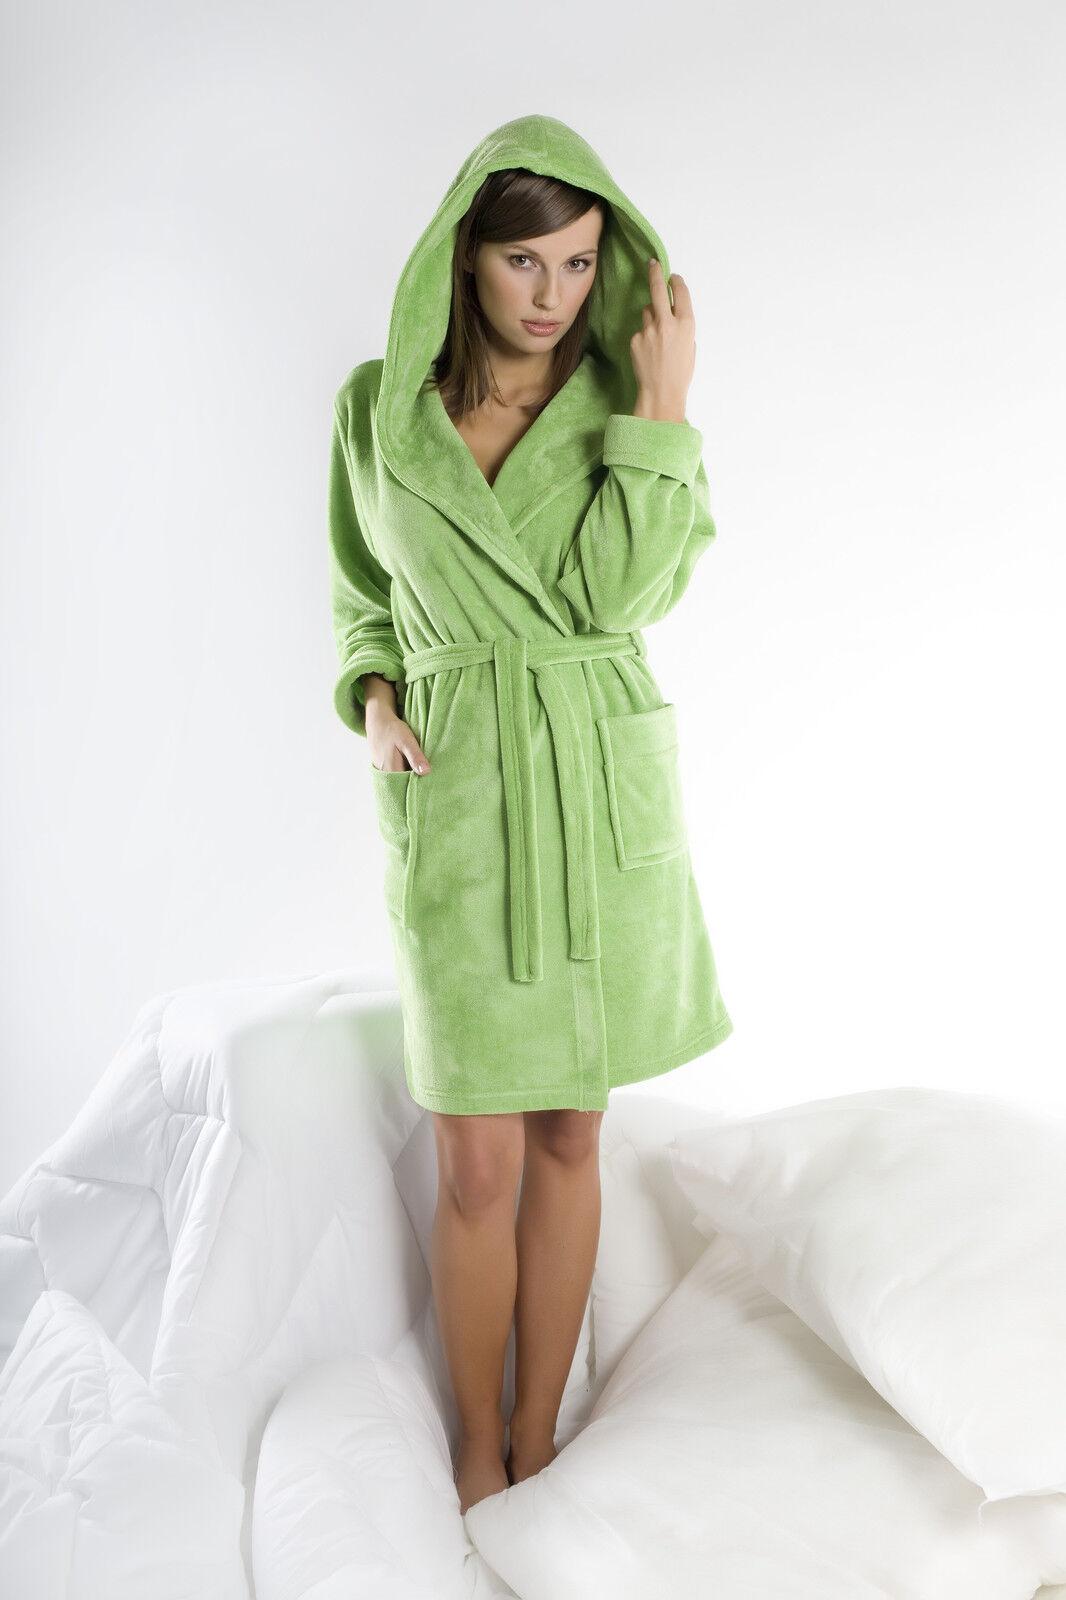 0d2e990fa0 Womens Cotton Blend Hooded Bathrobe Dressing Gown Housecoat UK Robe Size 8  10 12